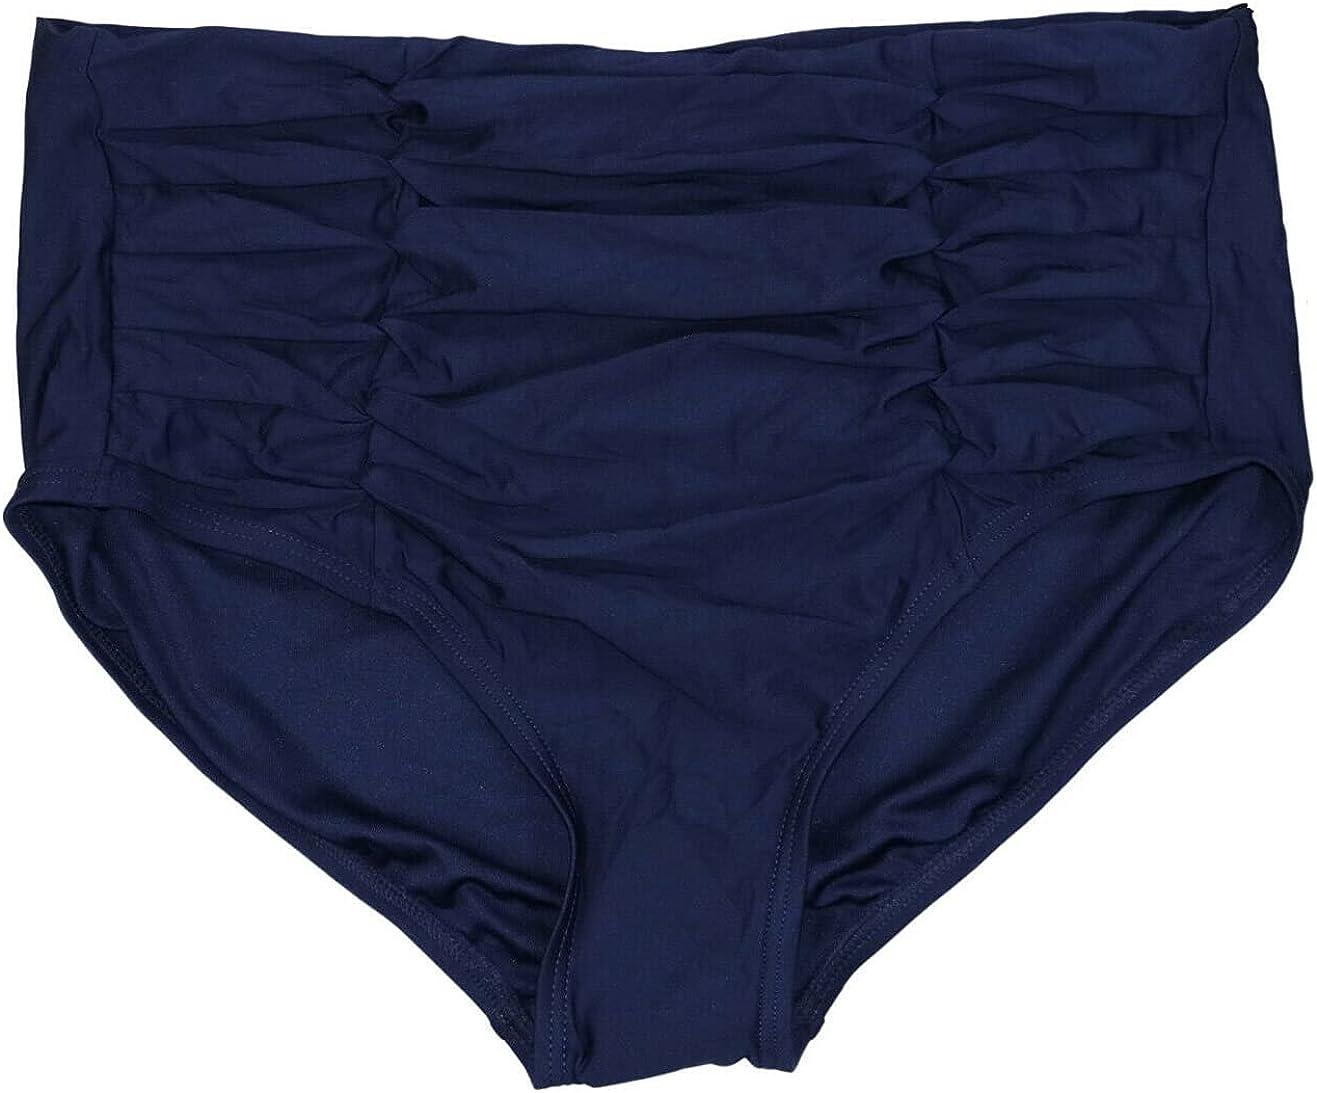 DKNY Women's Ruched High-Waist Bikini Bottom Navy Blue XX-Large